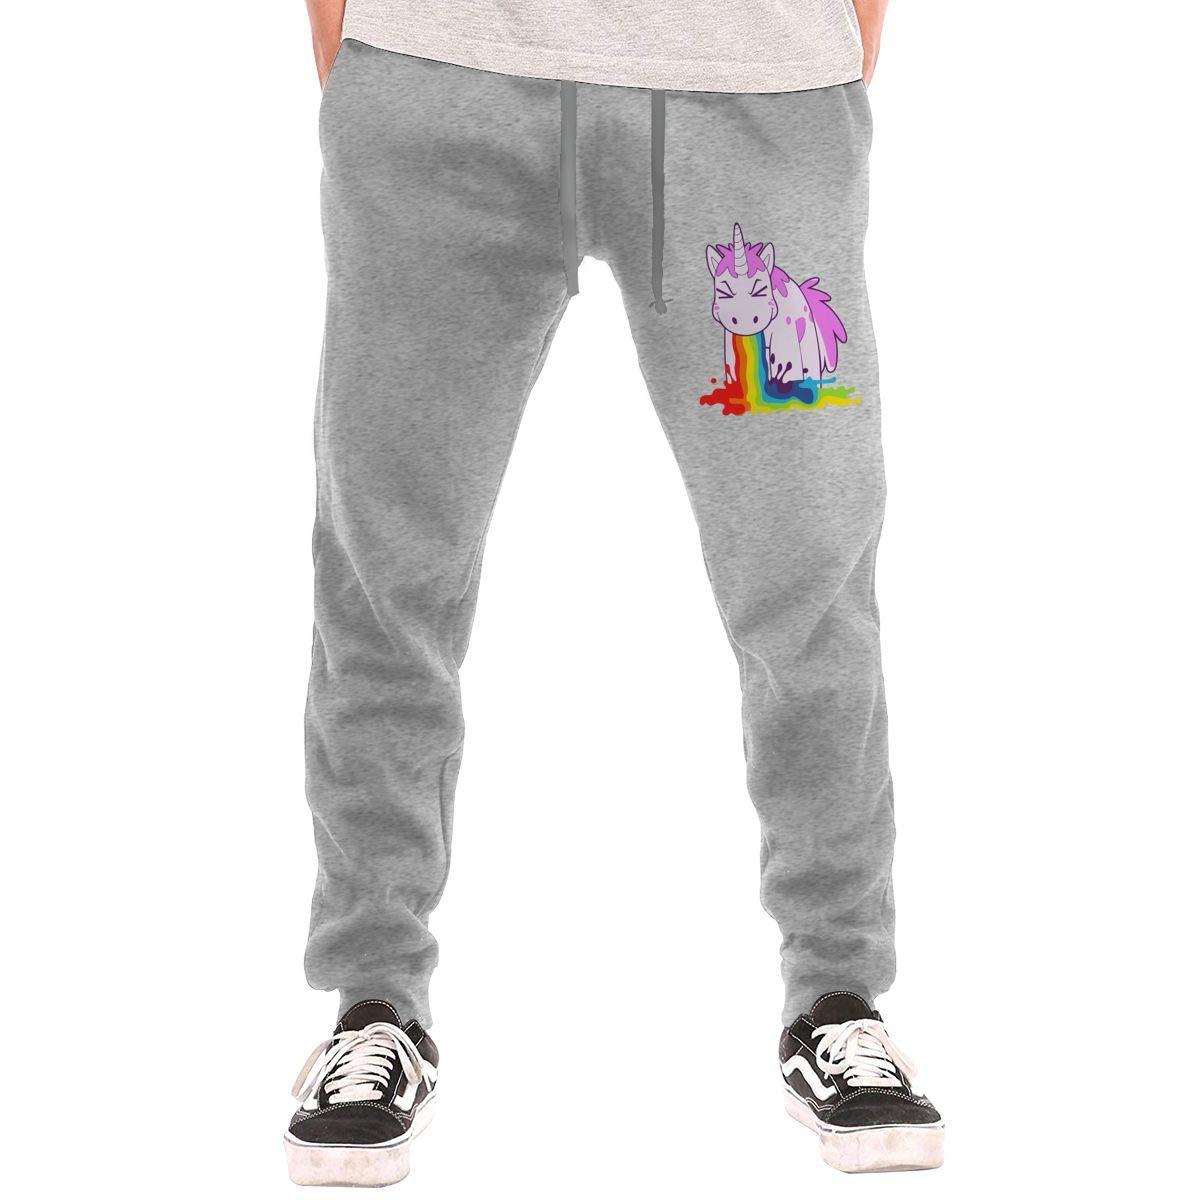 Unicorn I Puke Rainbows Drawstring Waist,100/% Cotton,Elastic Waist Cuffed,Jogger Sweatpants